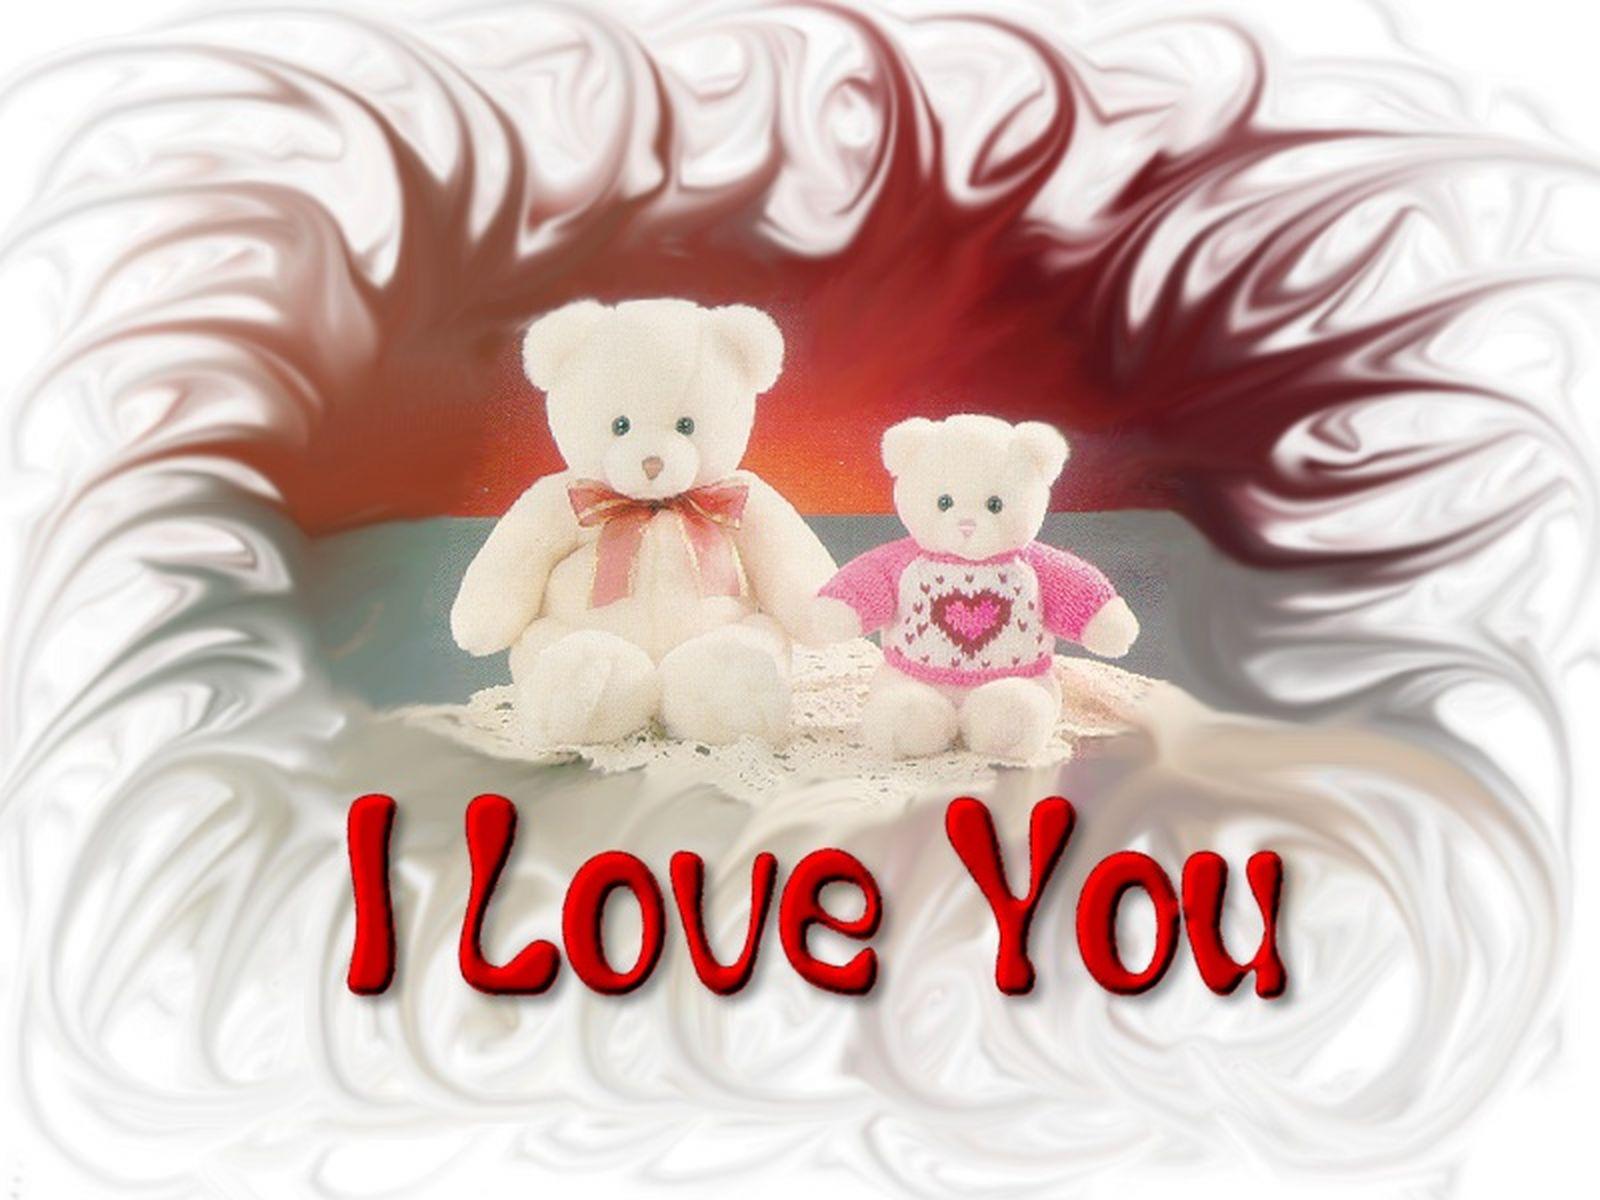 http://1.bp.blogspot.com/-GTWVVblSbRE/TbBrsdEZAQI/AAAAAAAAAlo/UvOKDxNJ7e8/s1600/47-Love%25252528www.Fun4uMobile.blogspot.com%25252529.JPG